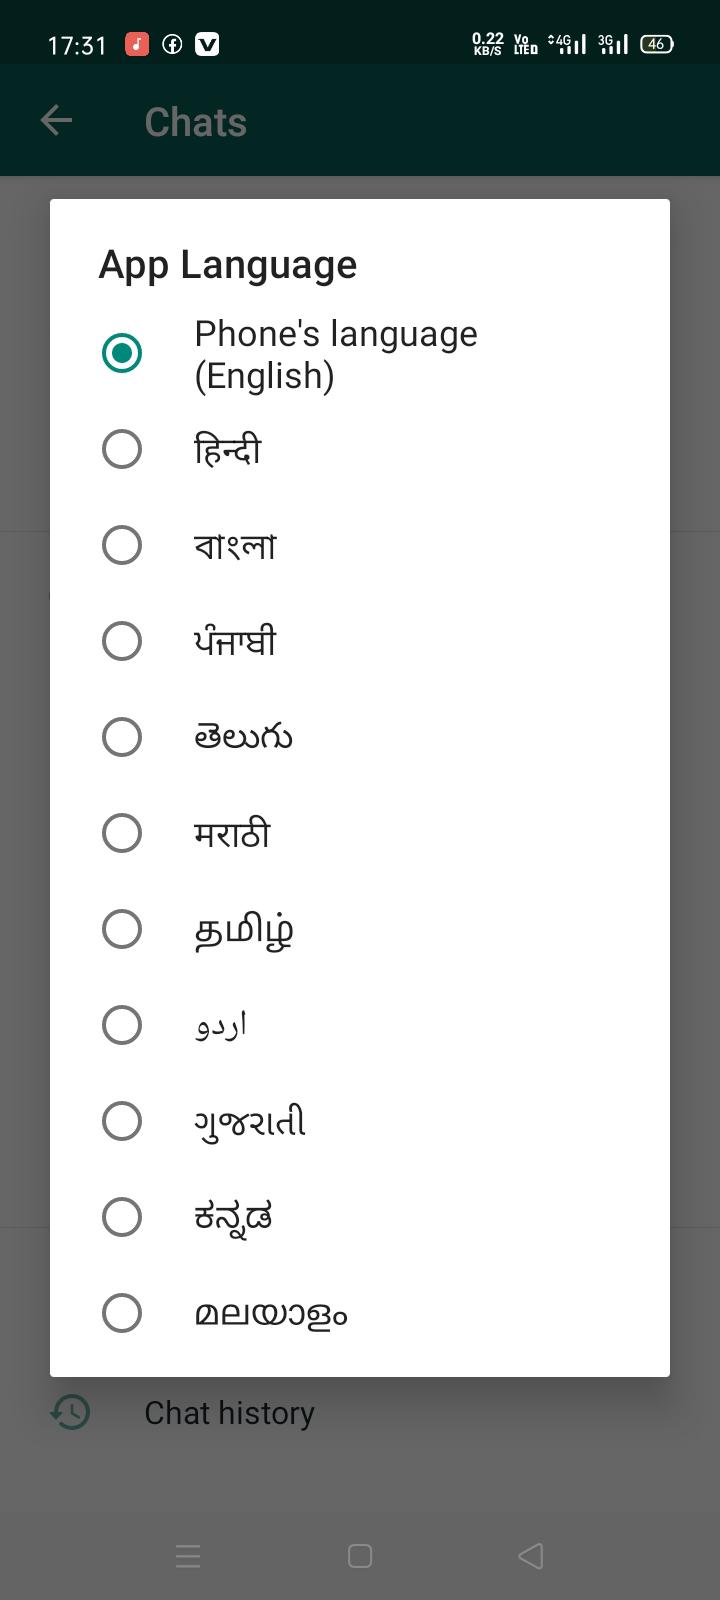 WhatsApp app language